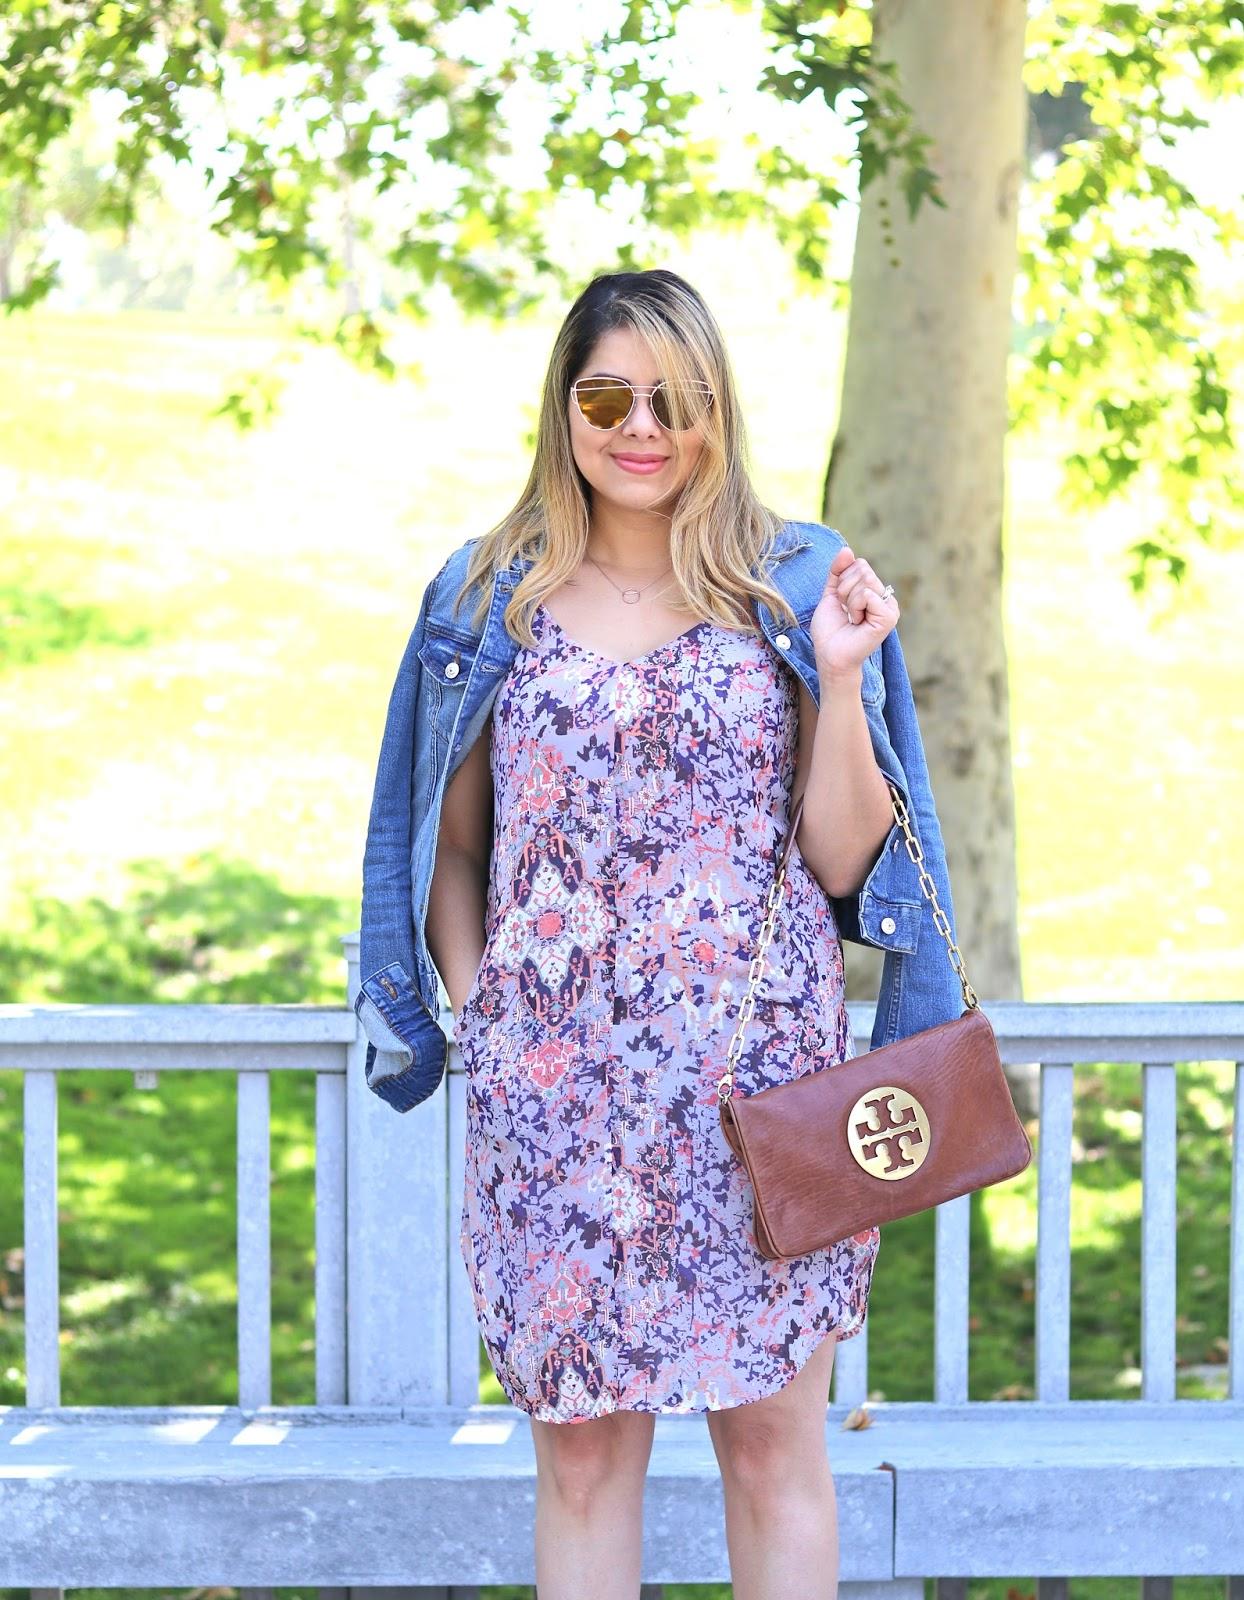 tory burch reva clutch, San Diego style, San Diego blogger, San Diego fashion, springtime look, spring 2016 lookbook, latina style blogger